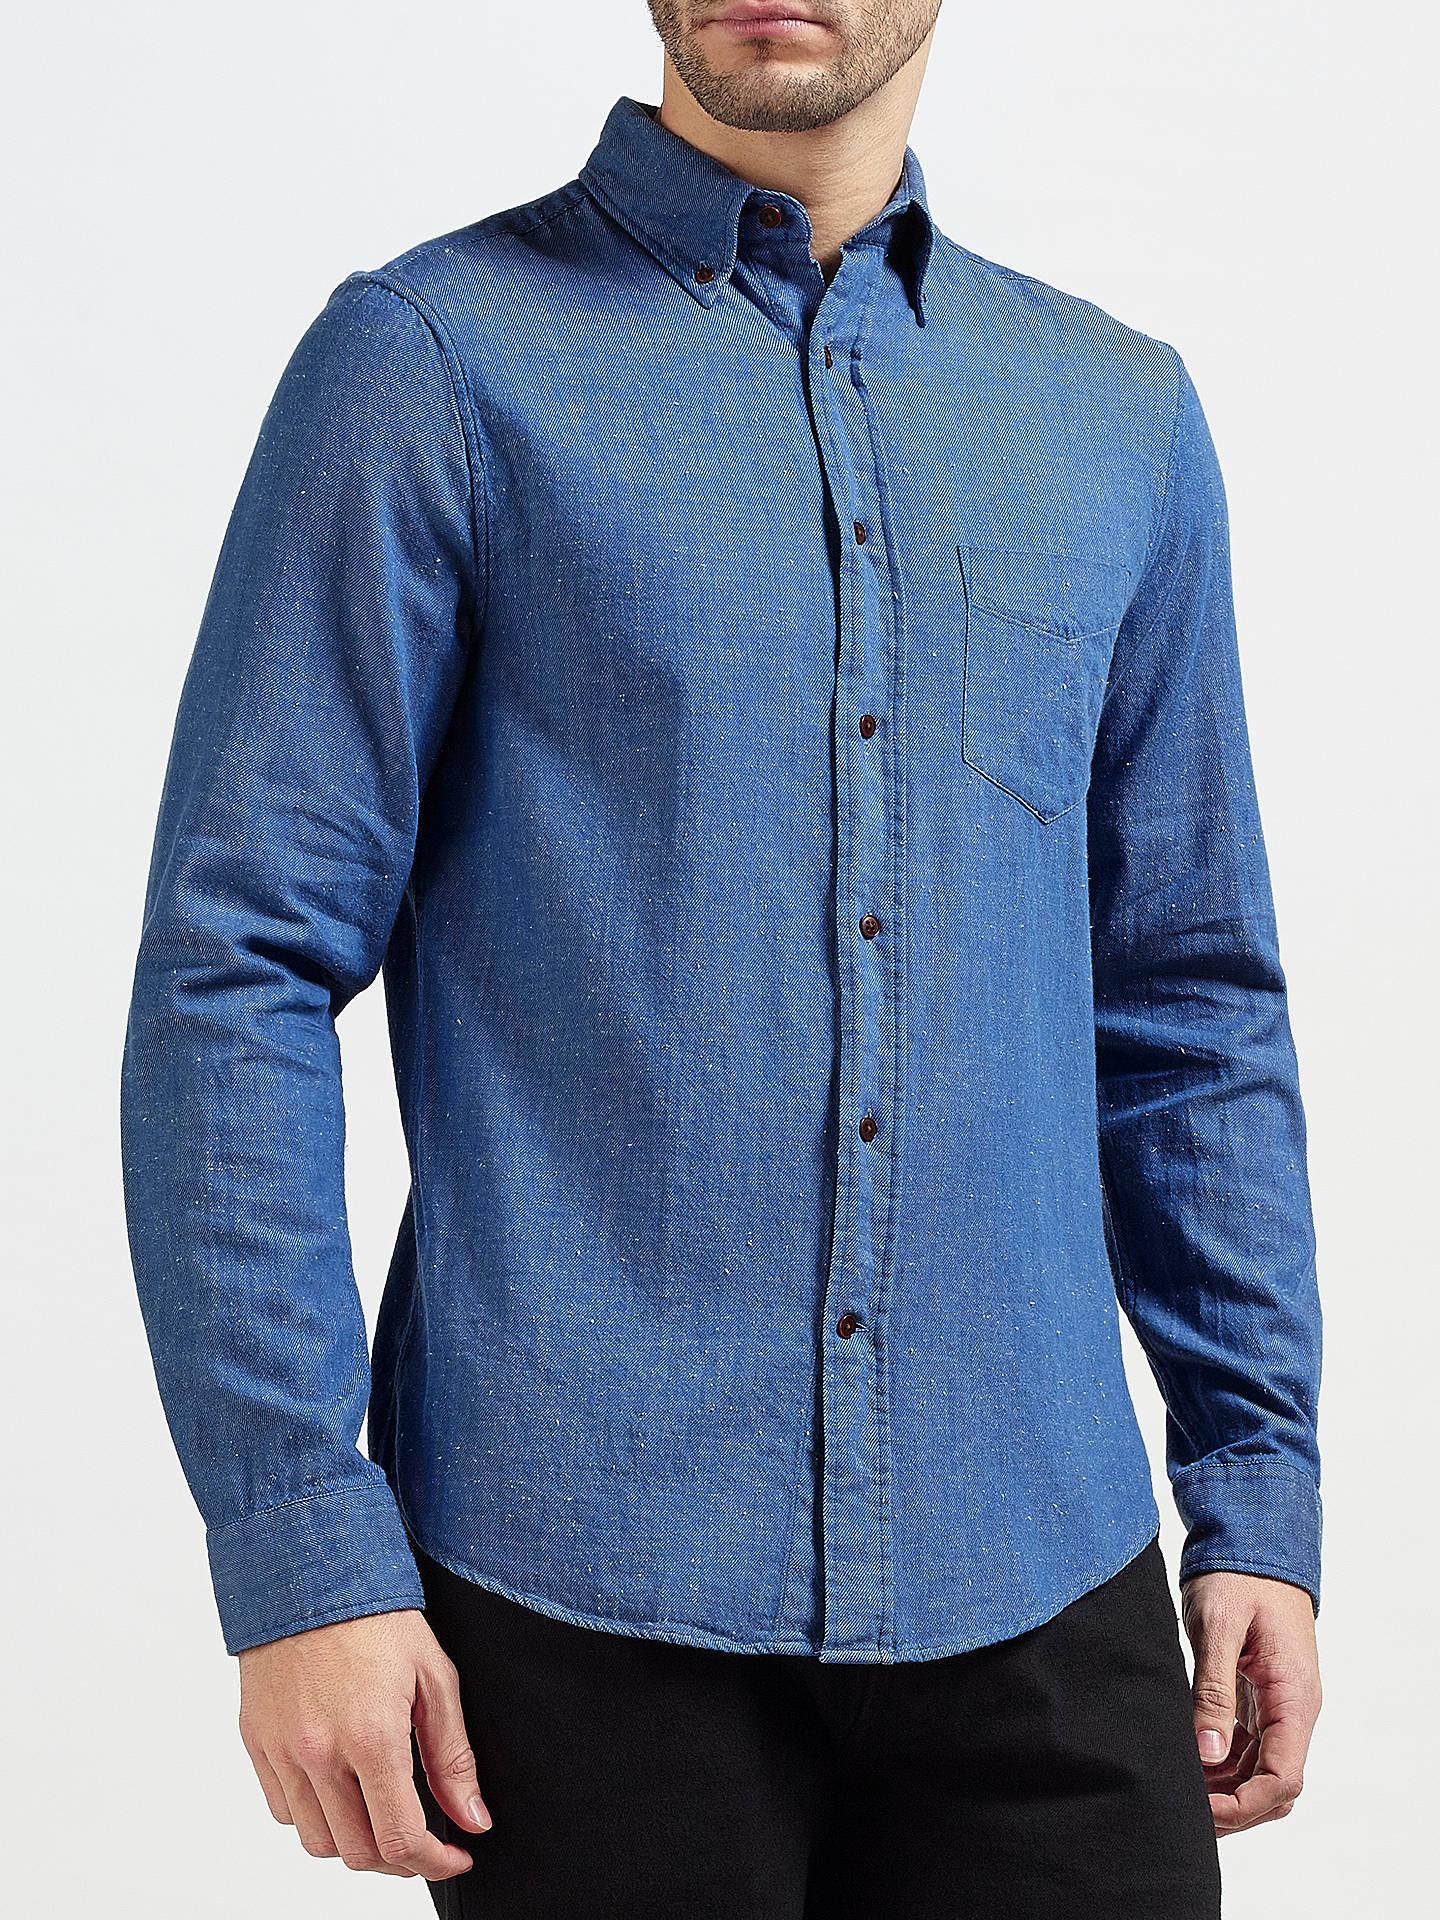 BuyGant Rugger Indigo Slub Twill Shirt Light Blue L Online At Johnlewis